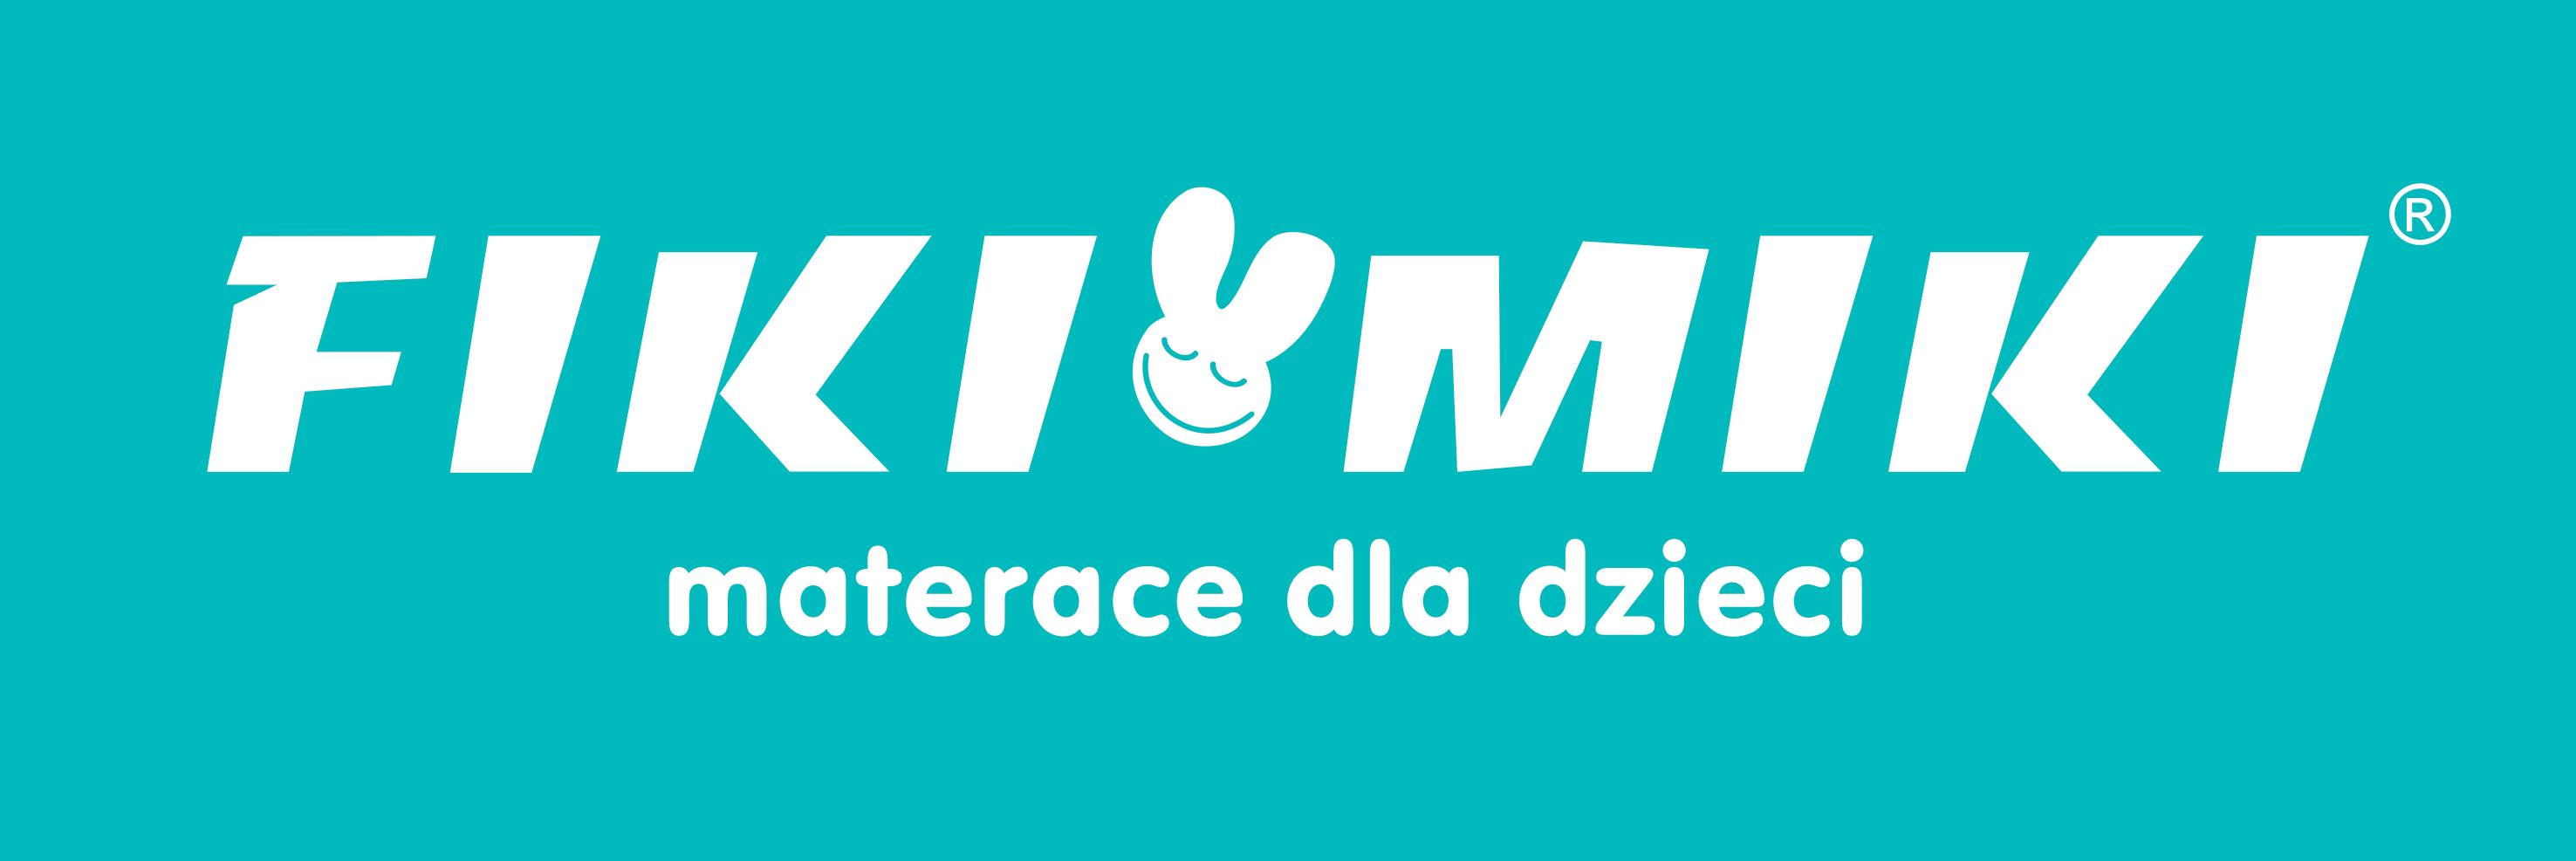 materacyk.pl